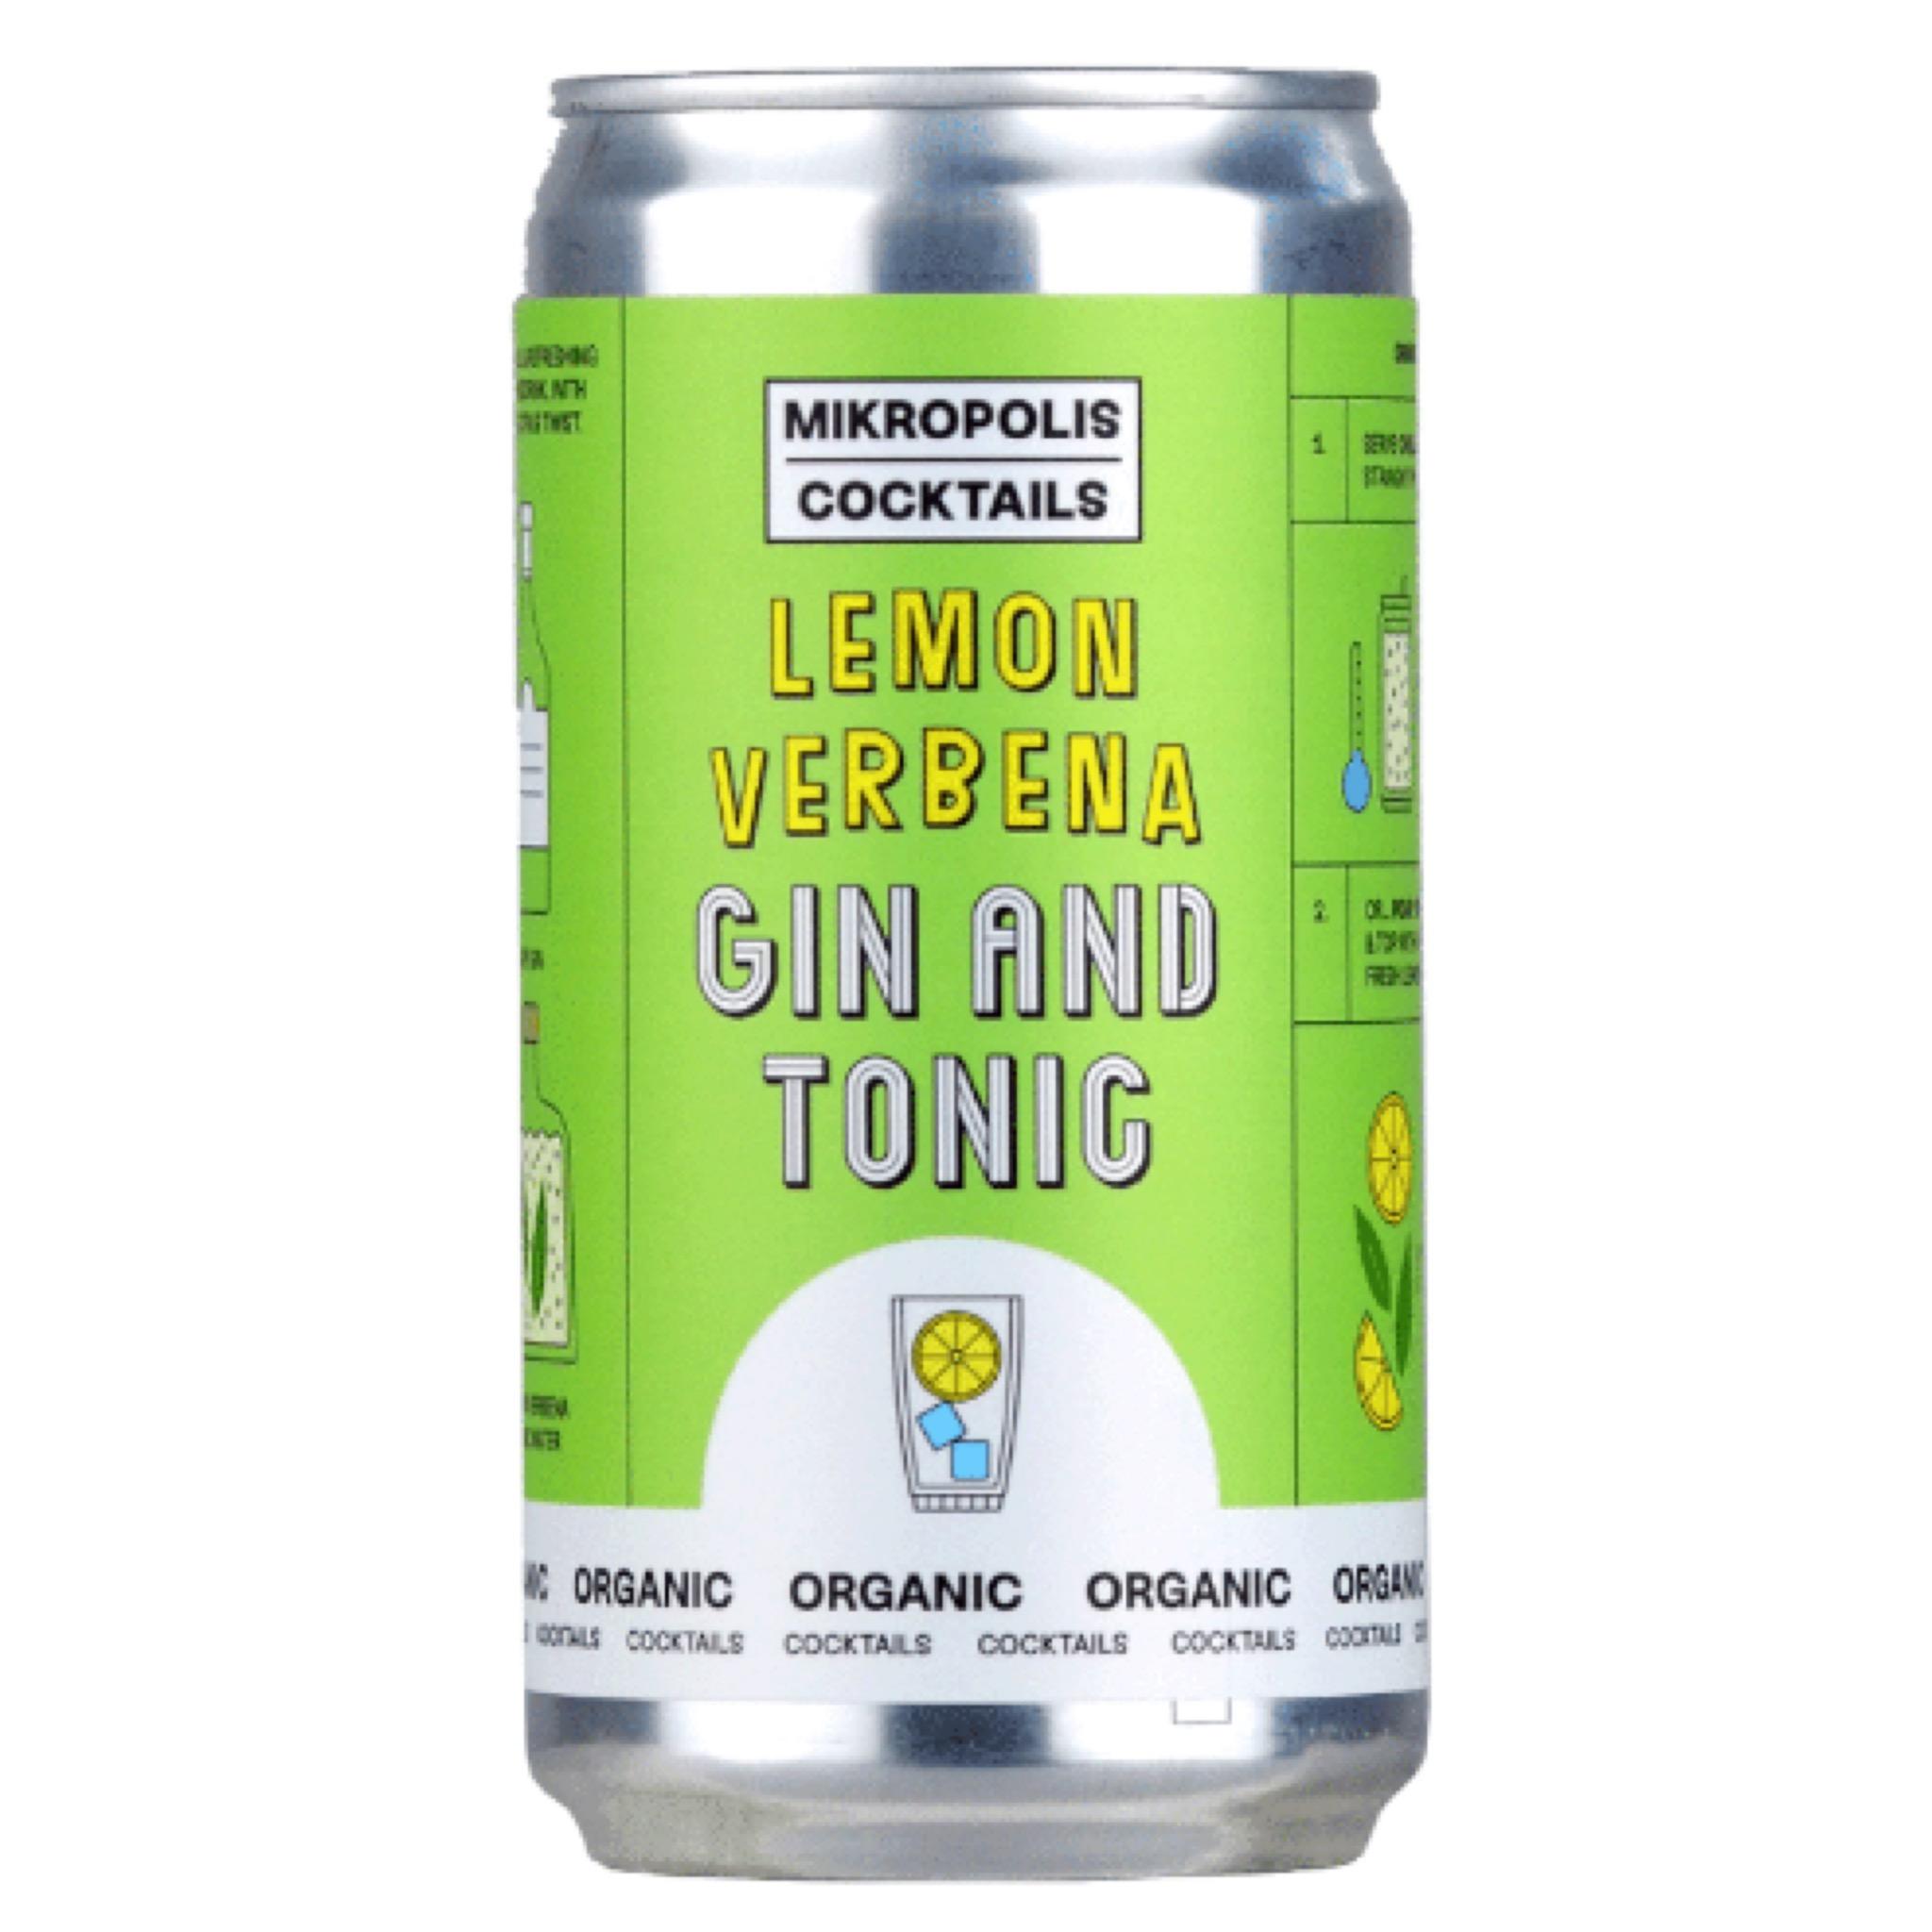 Lemon Verbena Gin & Tonic 6.5% 250ml Mikropolis Cocktails